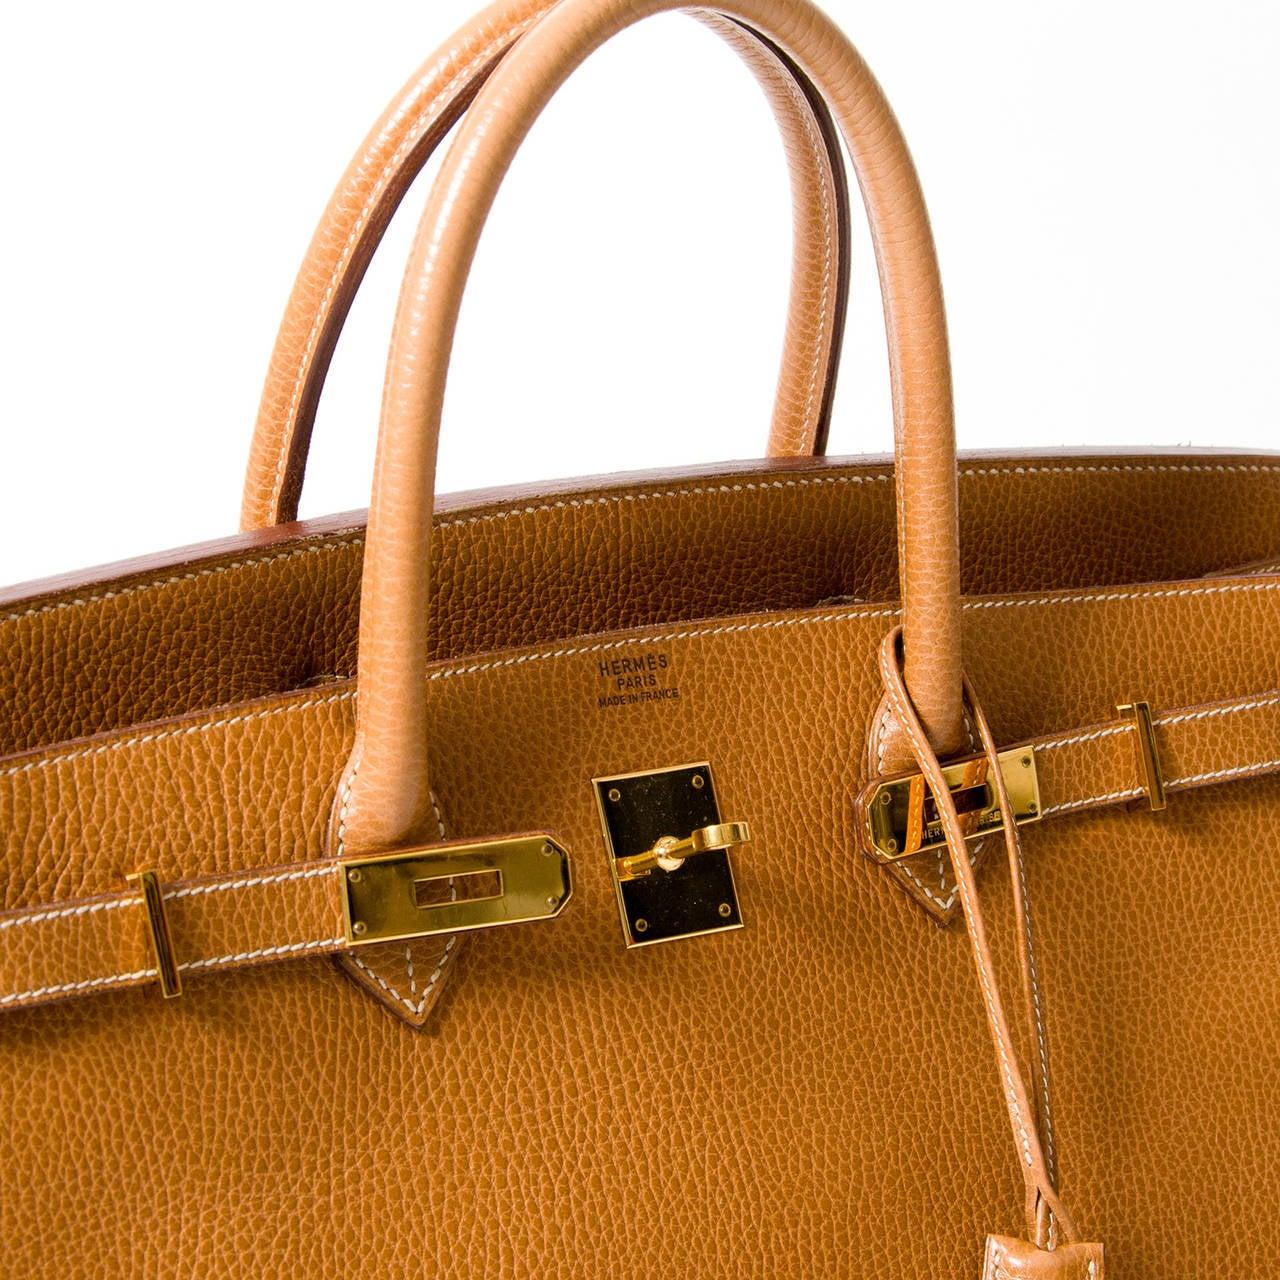 hermes leather wallet - hermes birkin 40 gold good condition